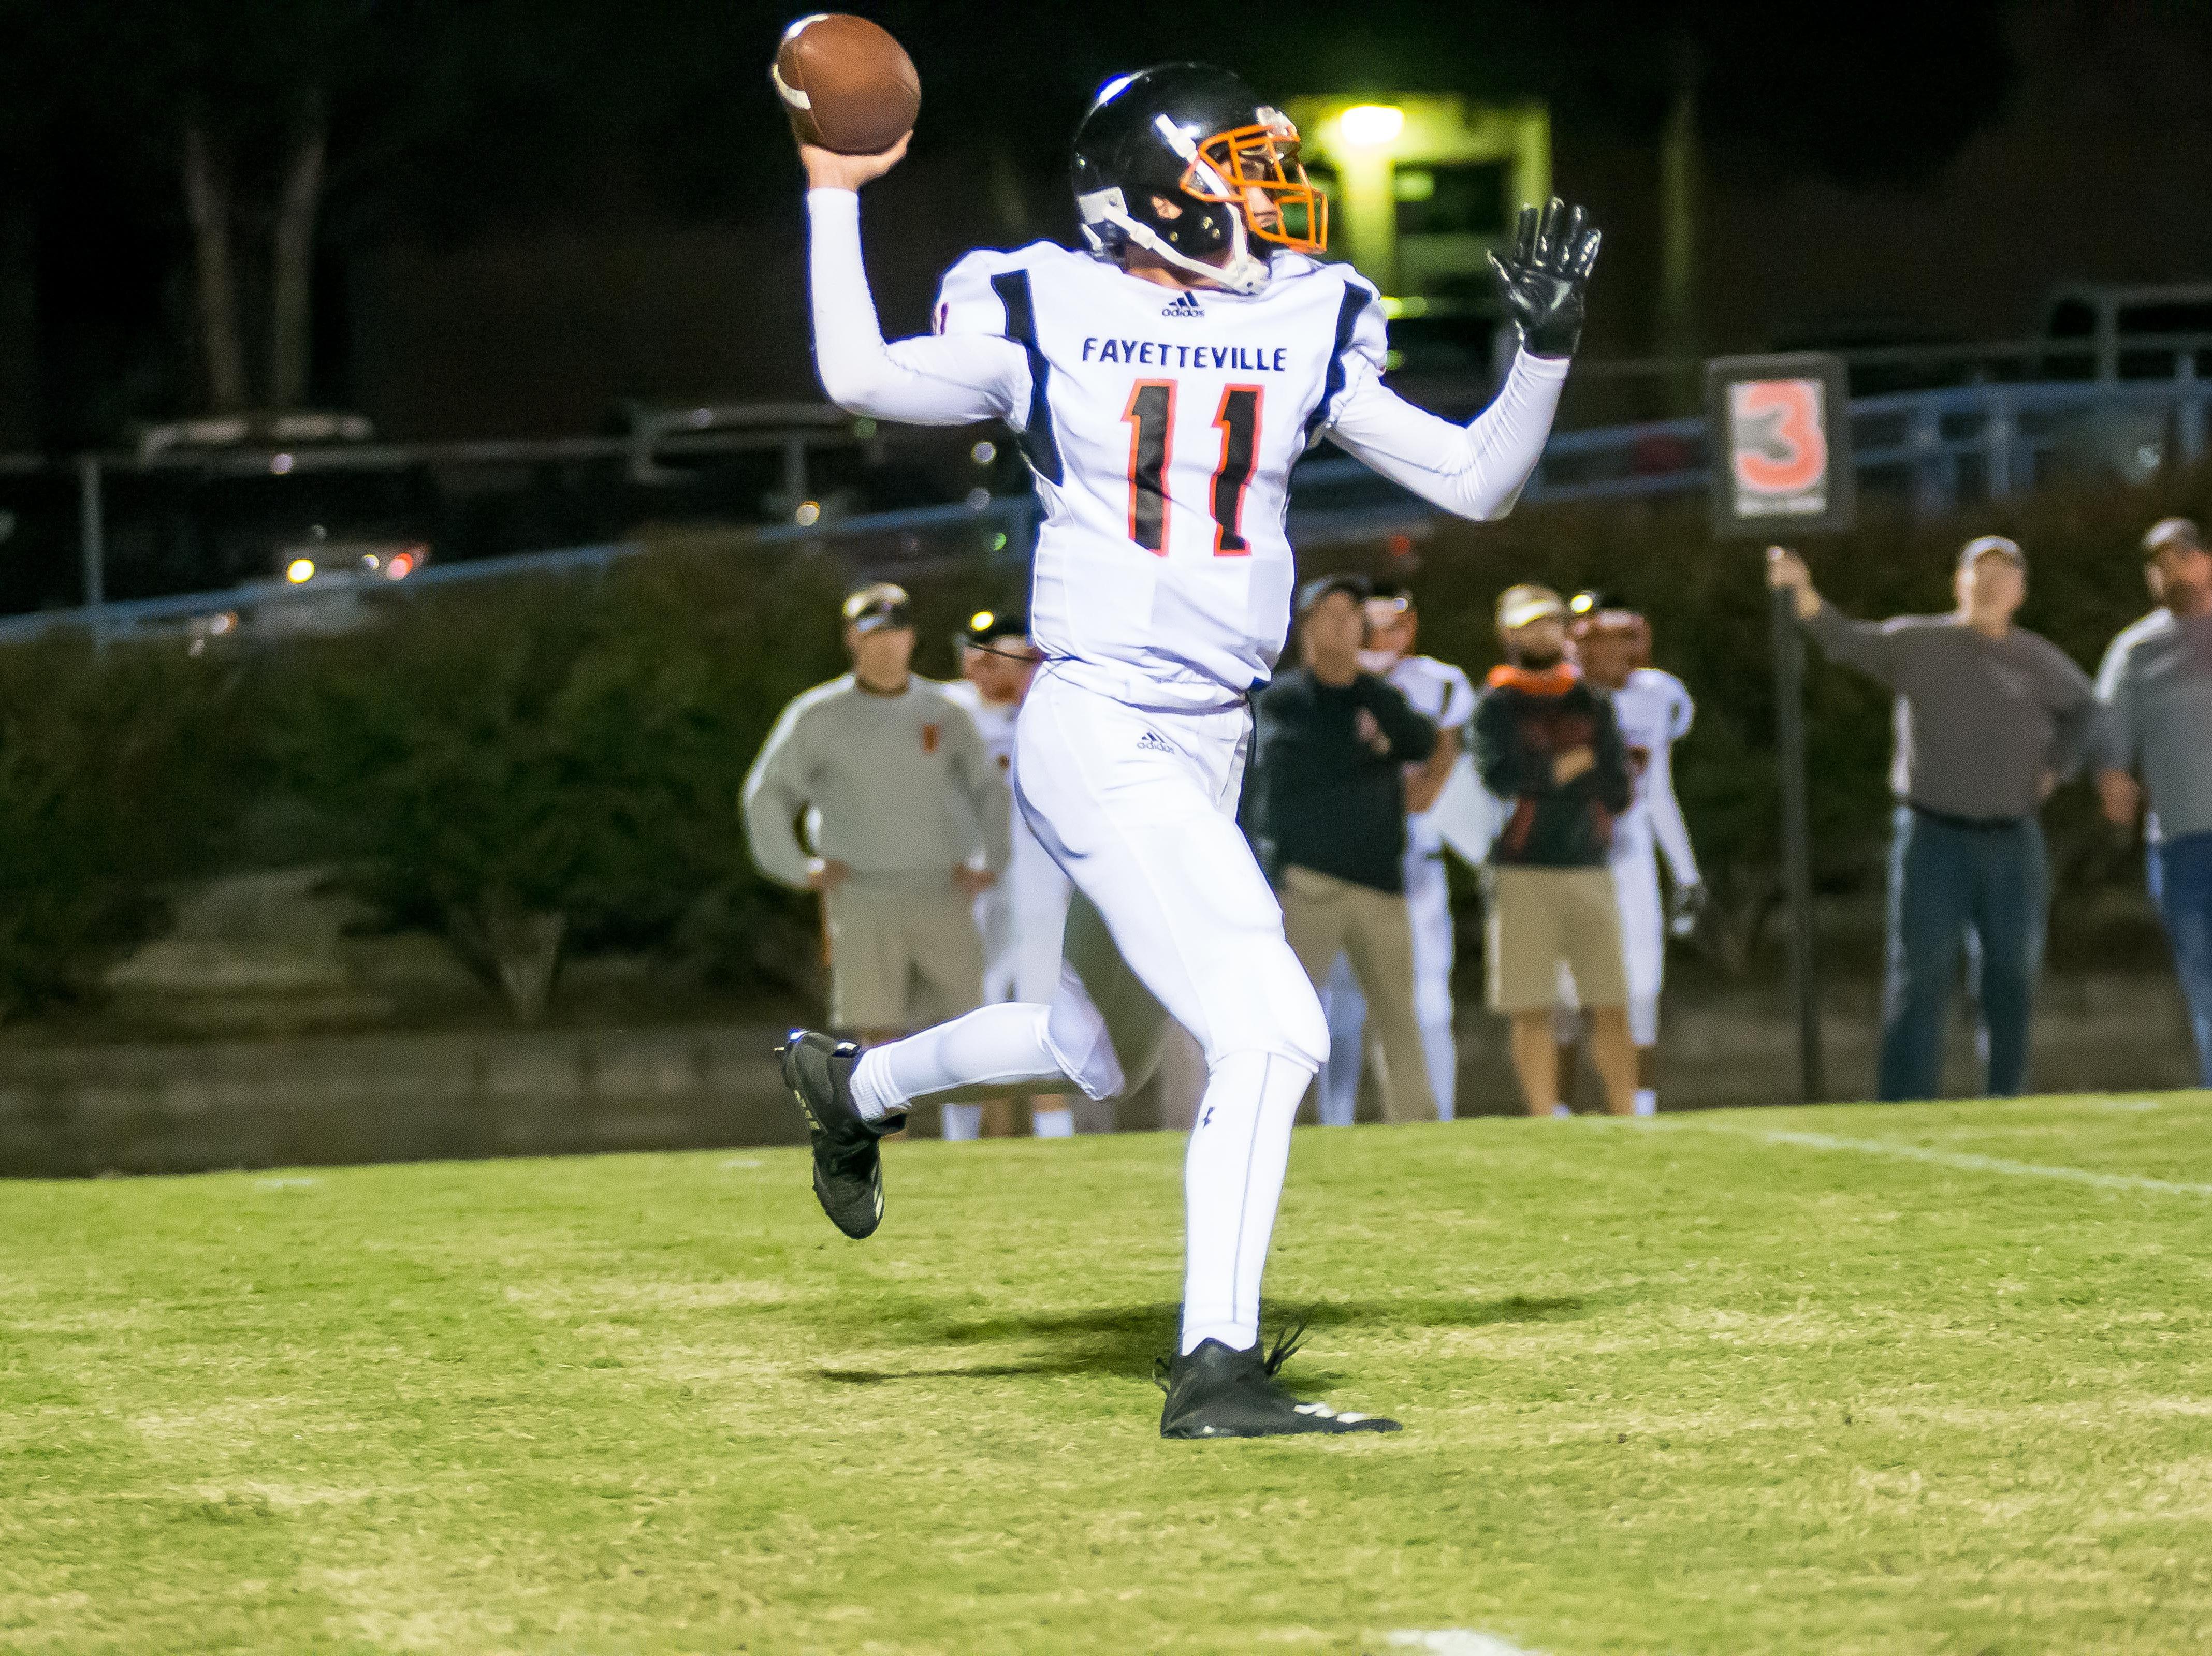 Fayetteville quarterback Levi Sloan throws a pass.